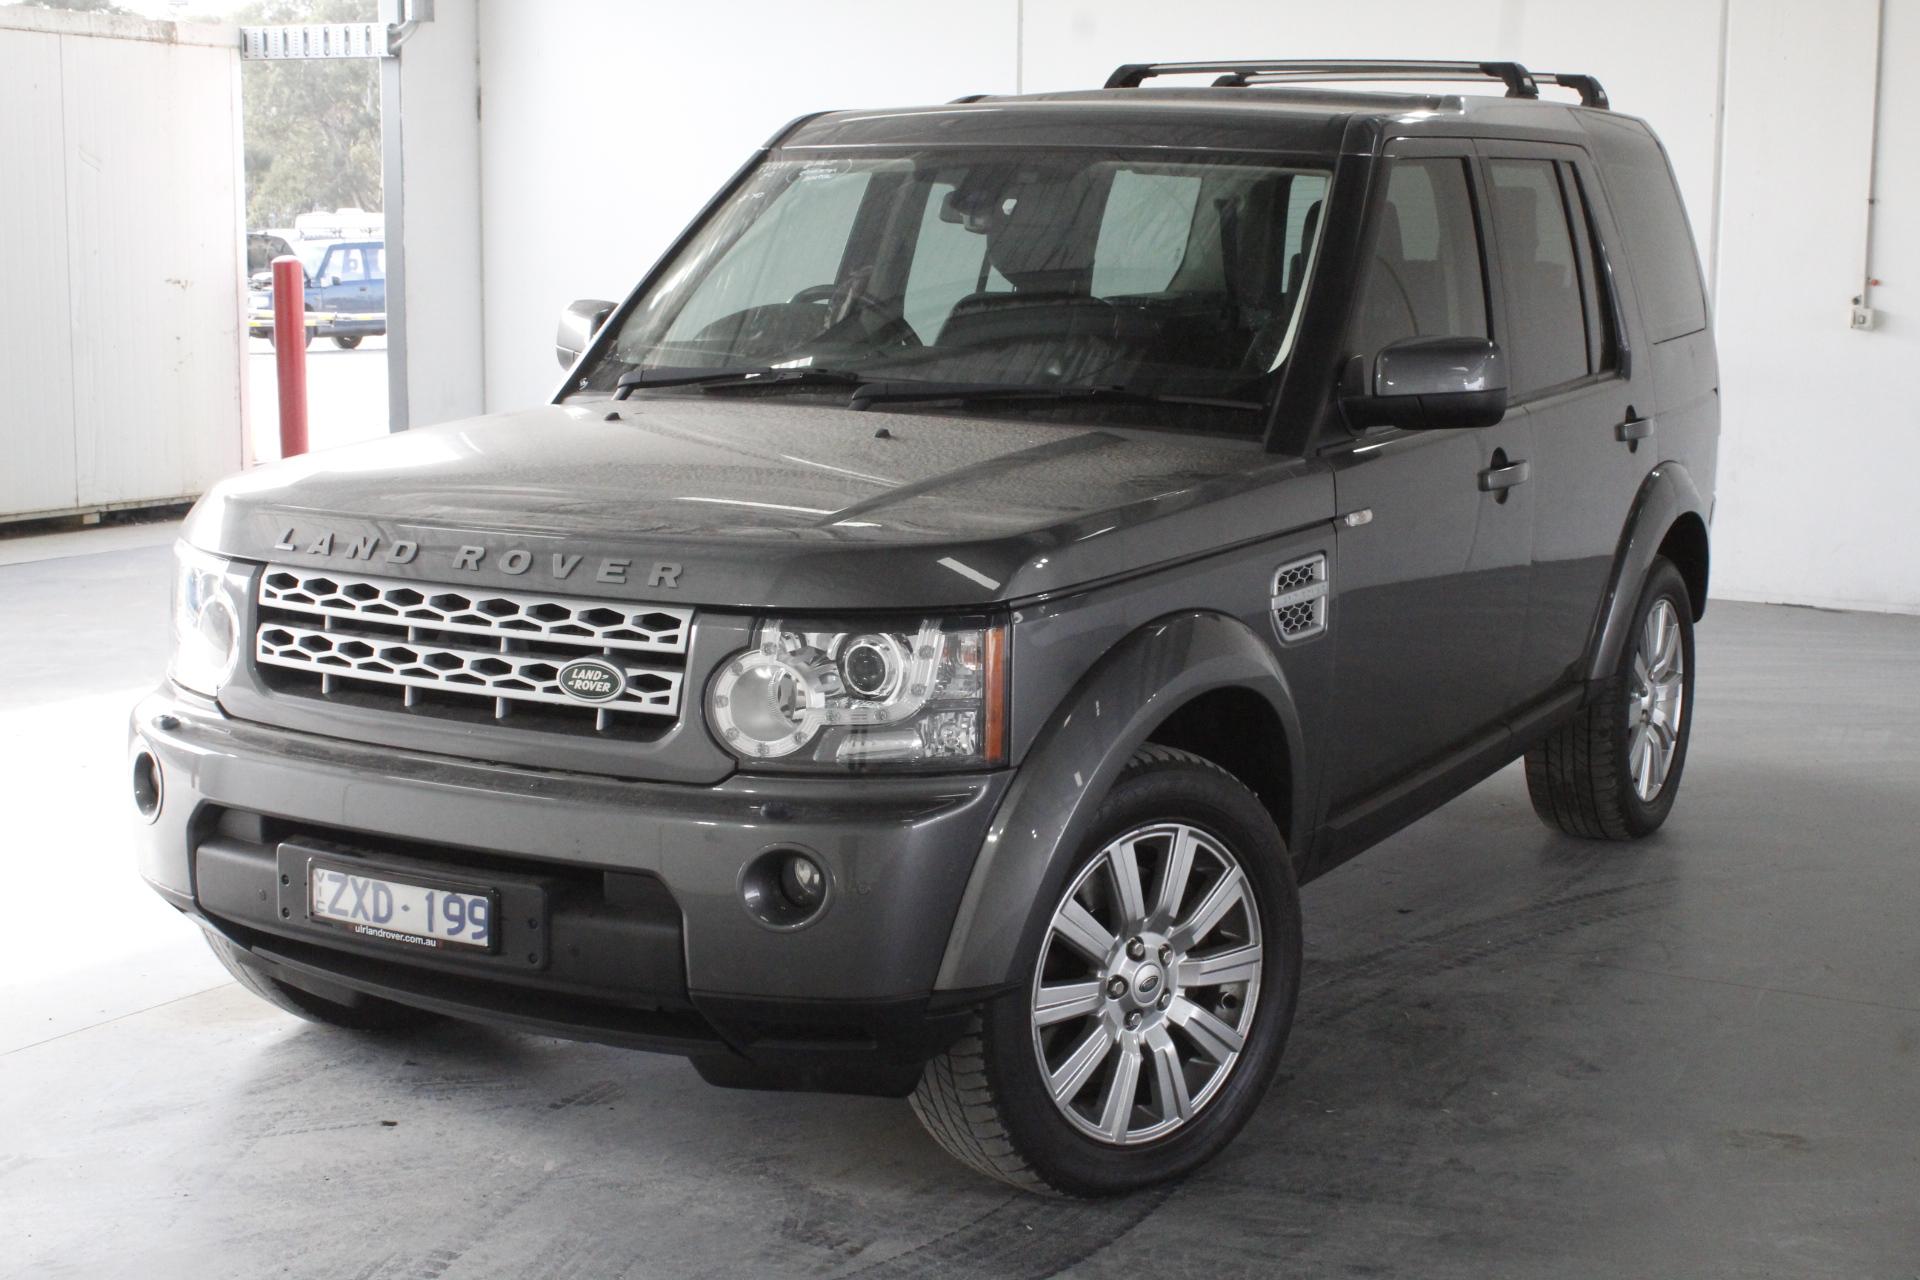 2013 Land Rover Discovery 3.0 SDV6 SE Series 4 T/D Auto 7 Seats Wagon